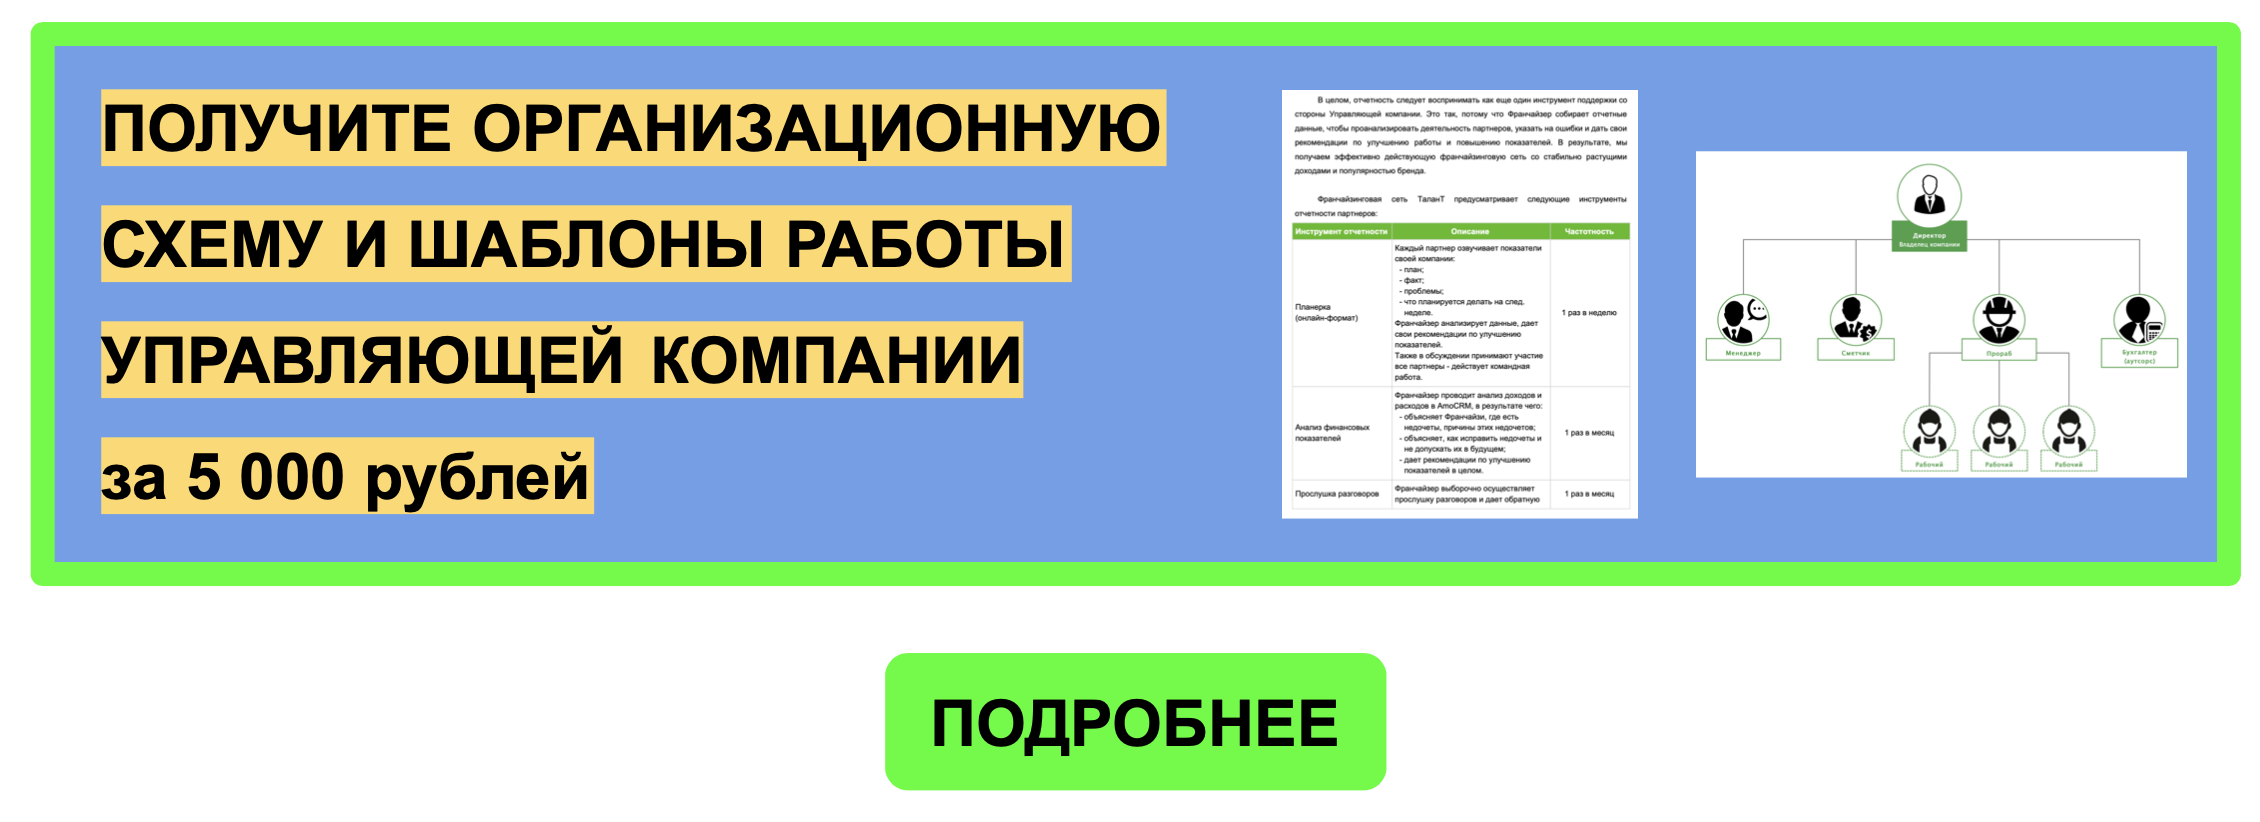 uprav-kompaniya-franshhiza-usluga